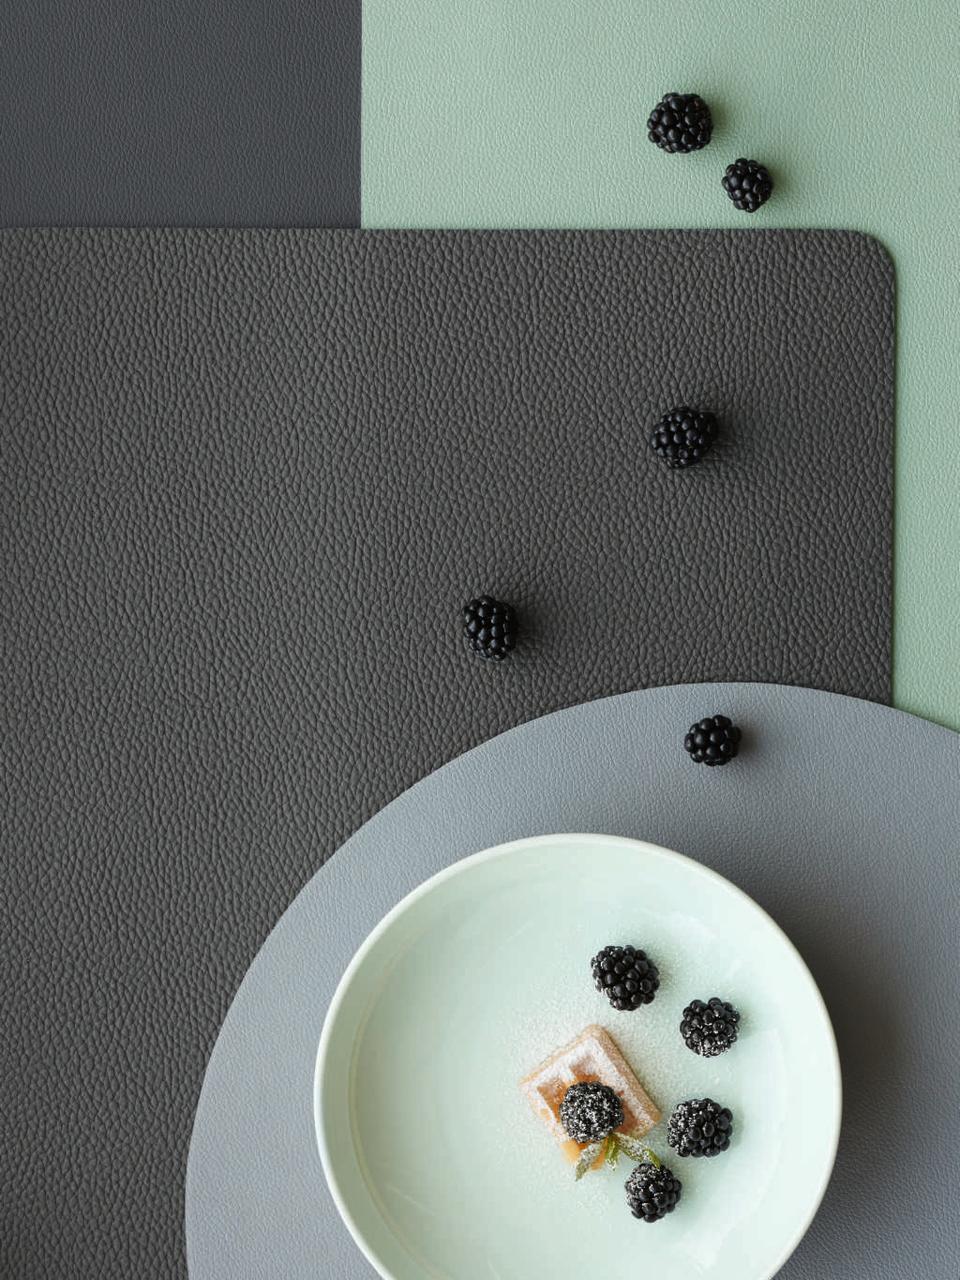 Kunstleder-Tischsets Pik, 2 Stück, Kunstleder (PVC), Schwarz, 33 x 46 cm